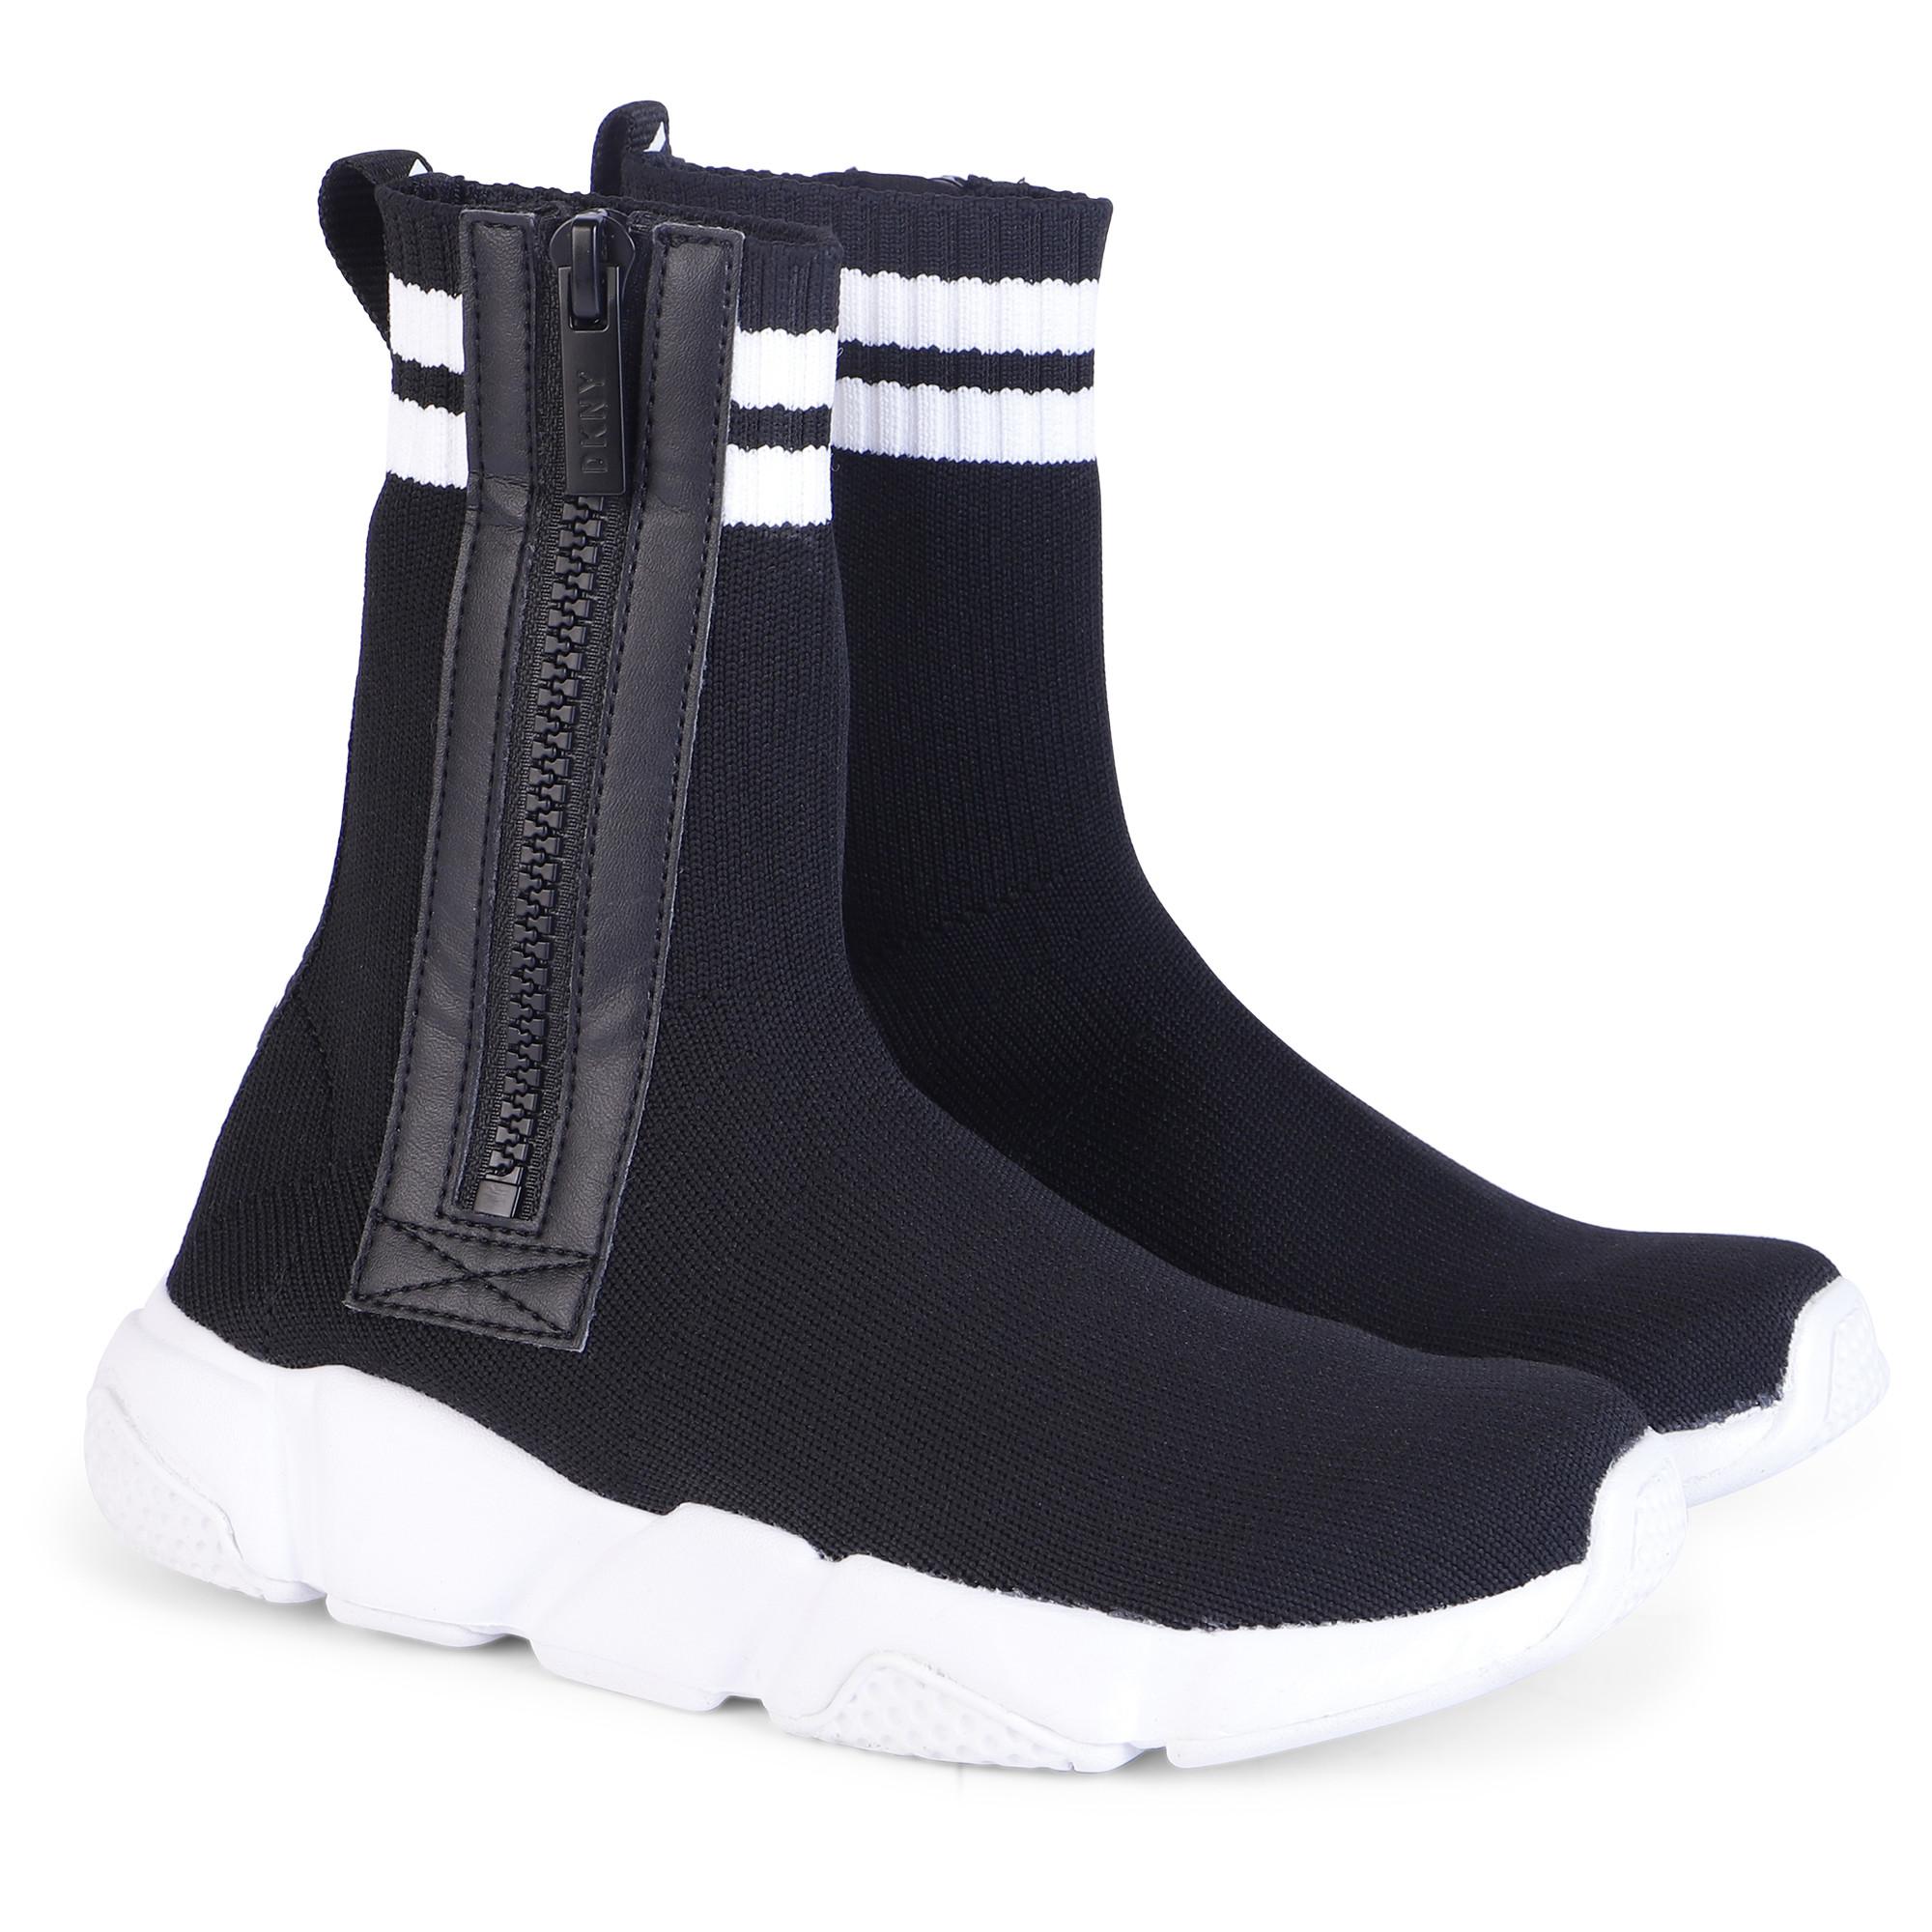 DKNY Logo Sock Sneakers in Black